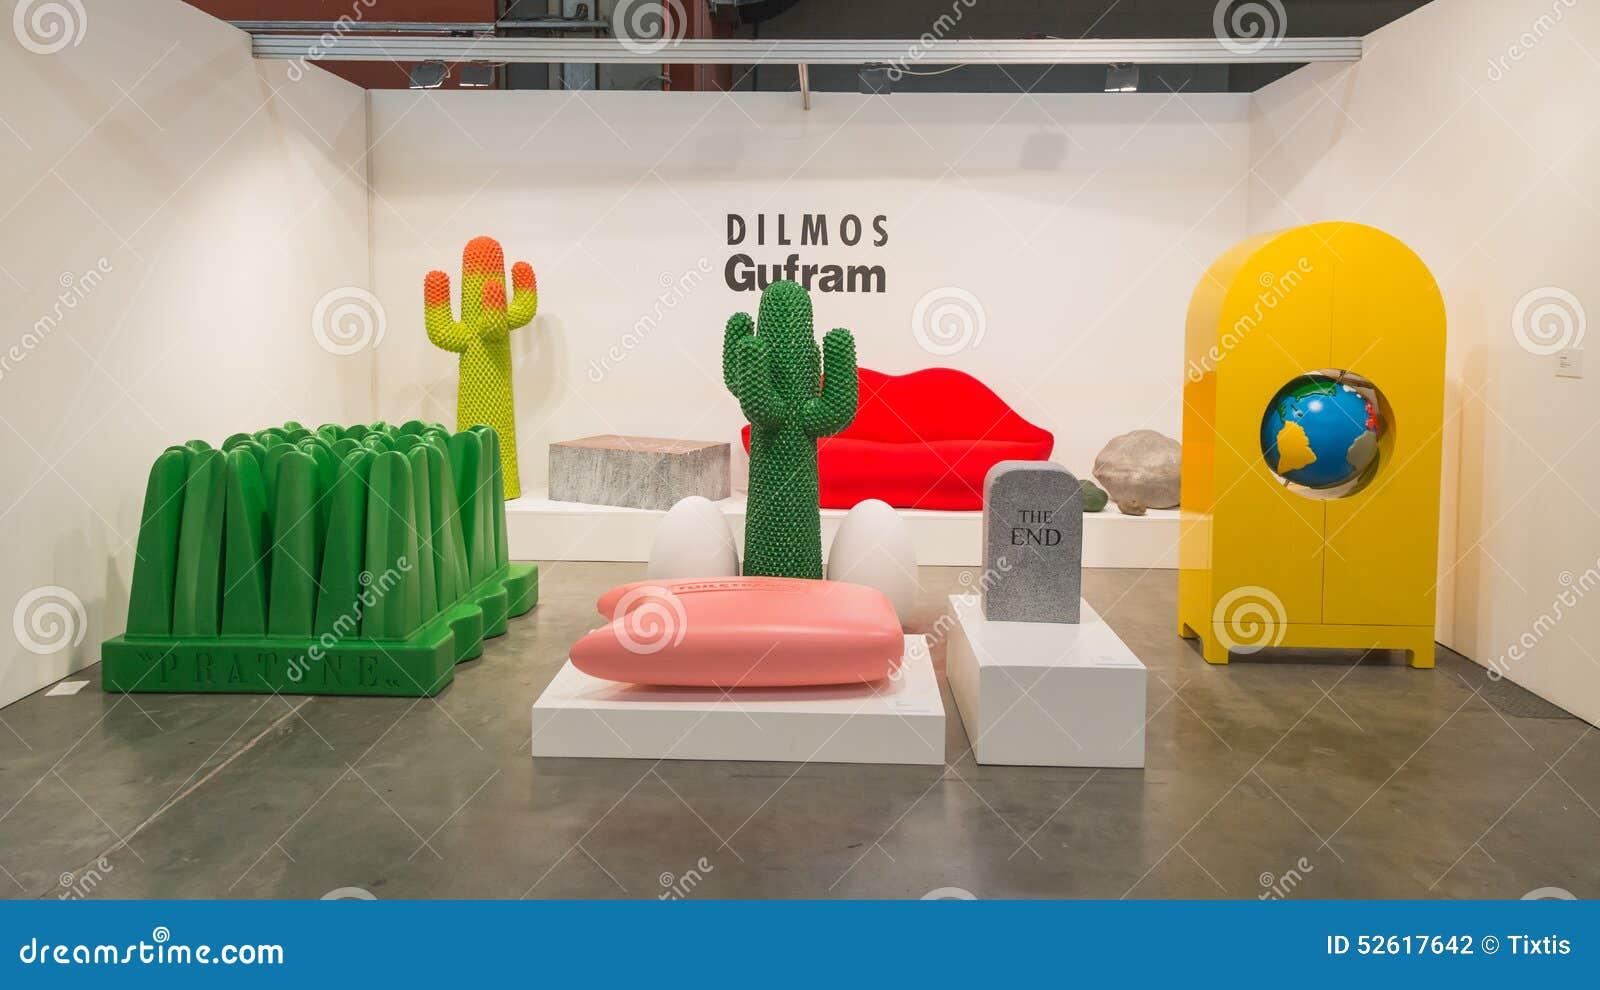 Design Furniture At Miart 2015 In Milan Italy Editorial